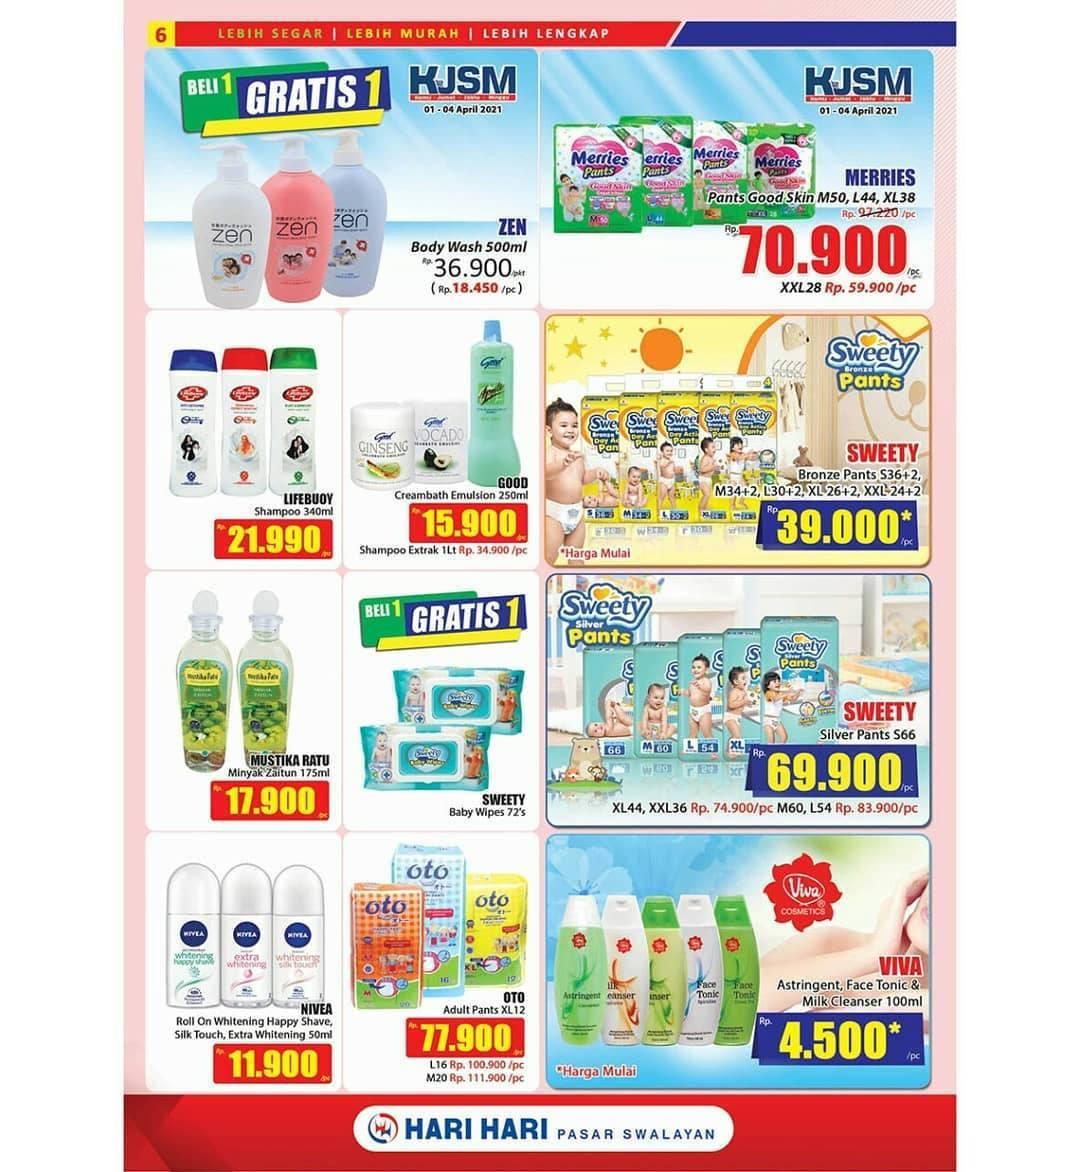 Promo diskon Katalog Promo Hari Hari Swalayan Promo PAS Periode 29 April - 5 Mei 2021